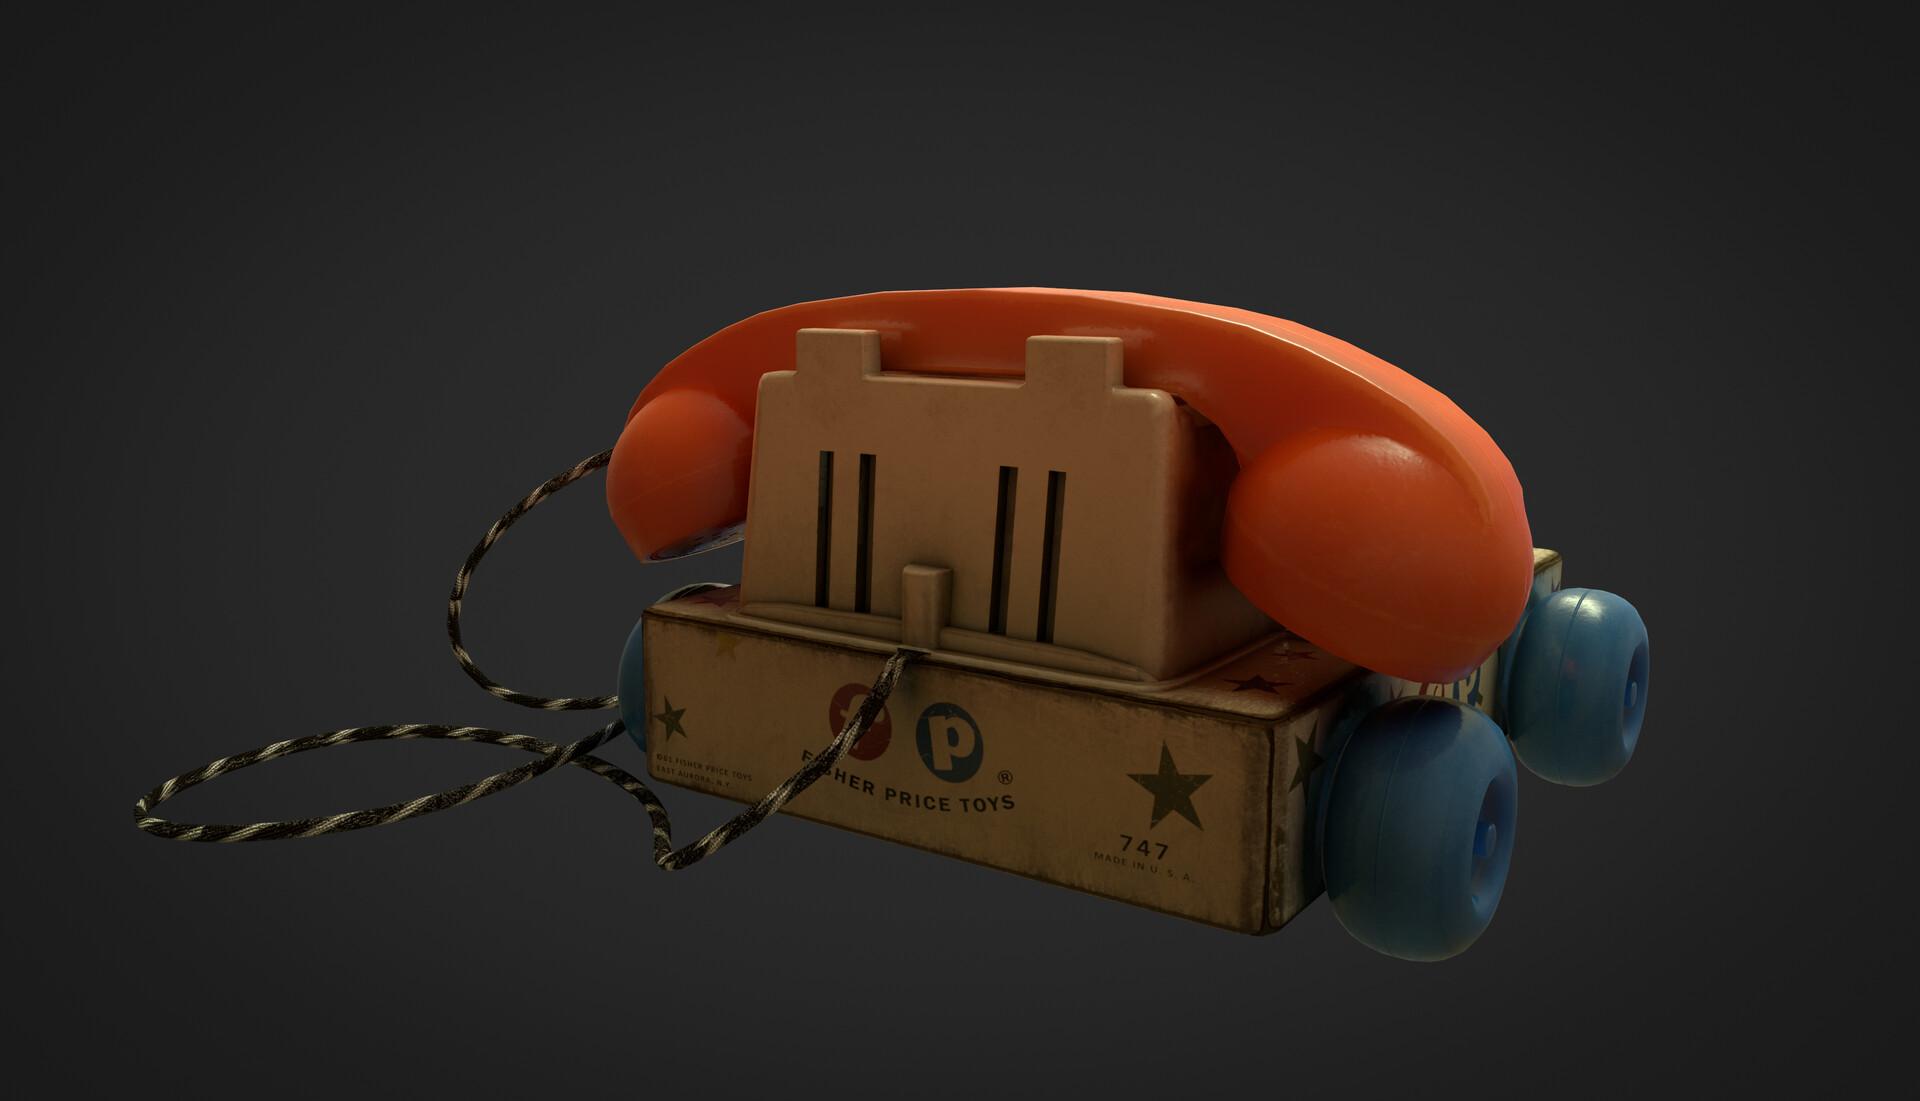 Hanna stenow chatterphone2